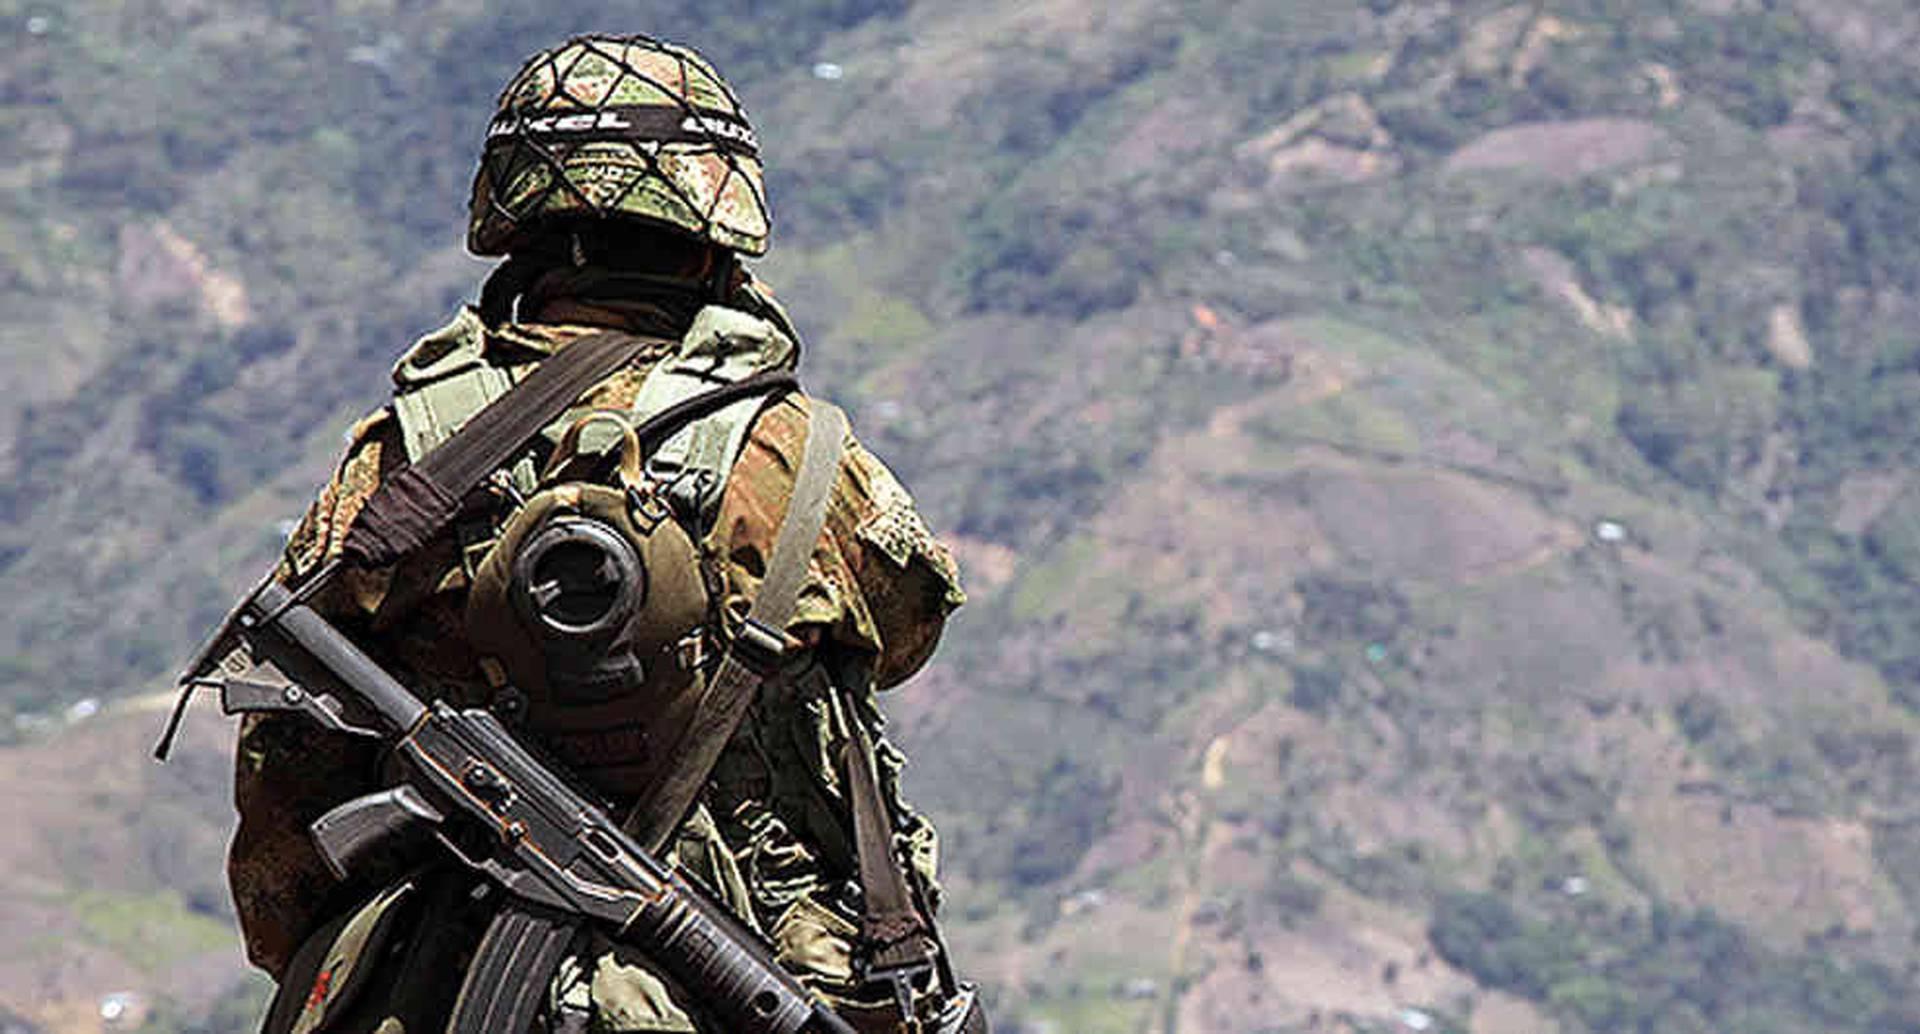 Militar en Antioquia denuncia irregularidades que comprometen a su comandante/Foto: archivo SEMANA